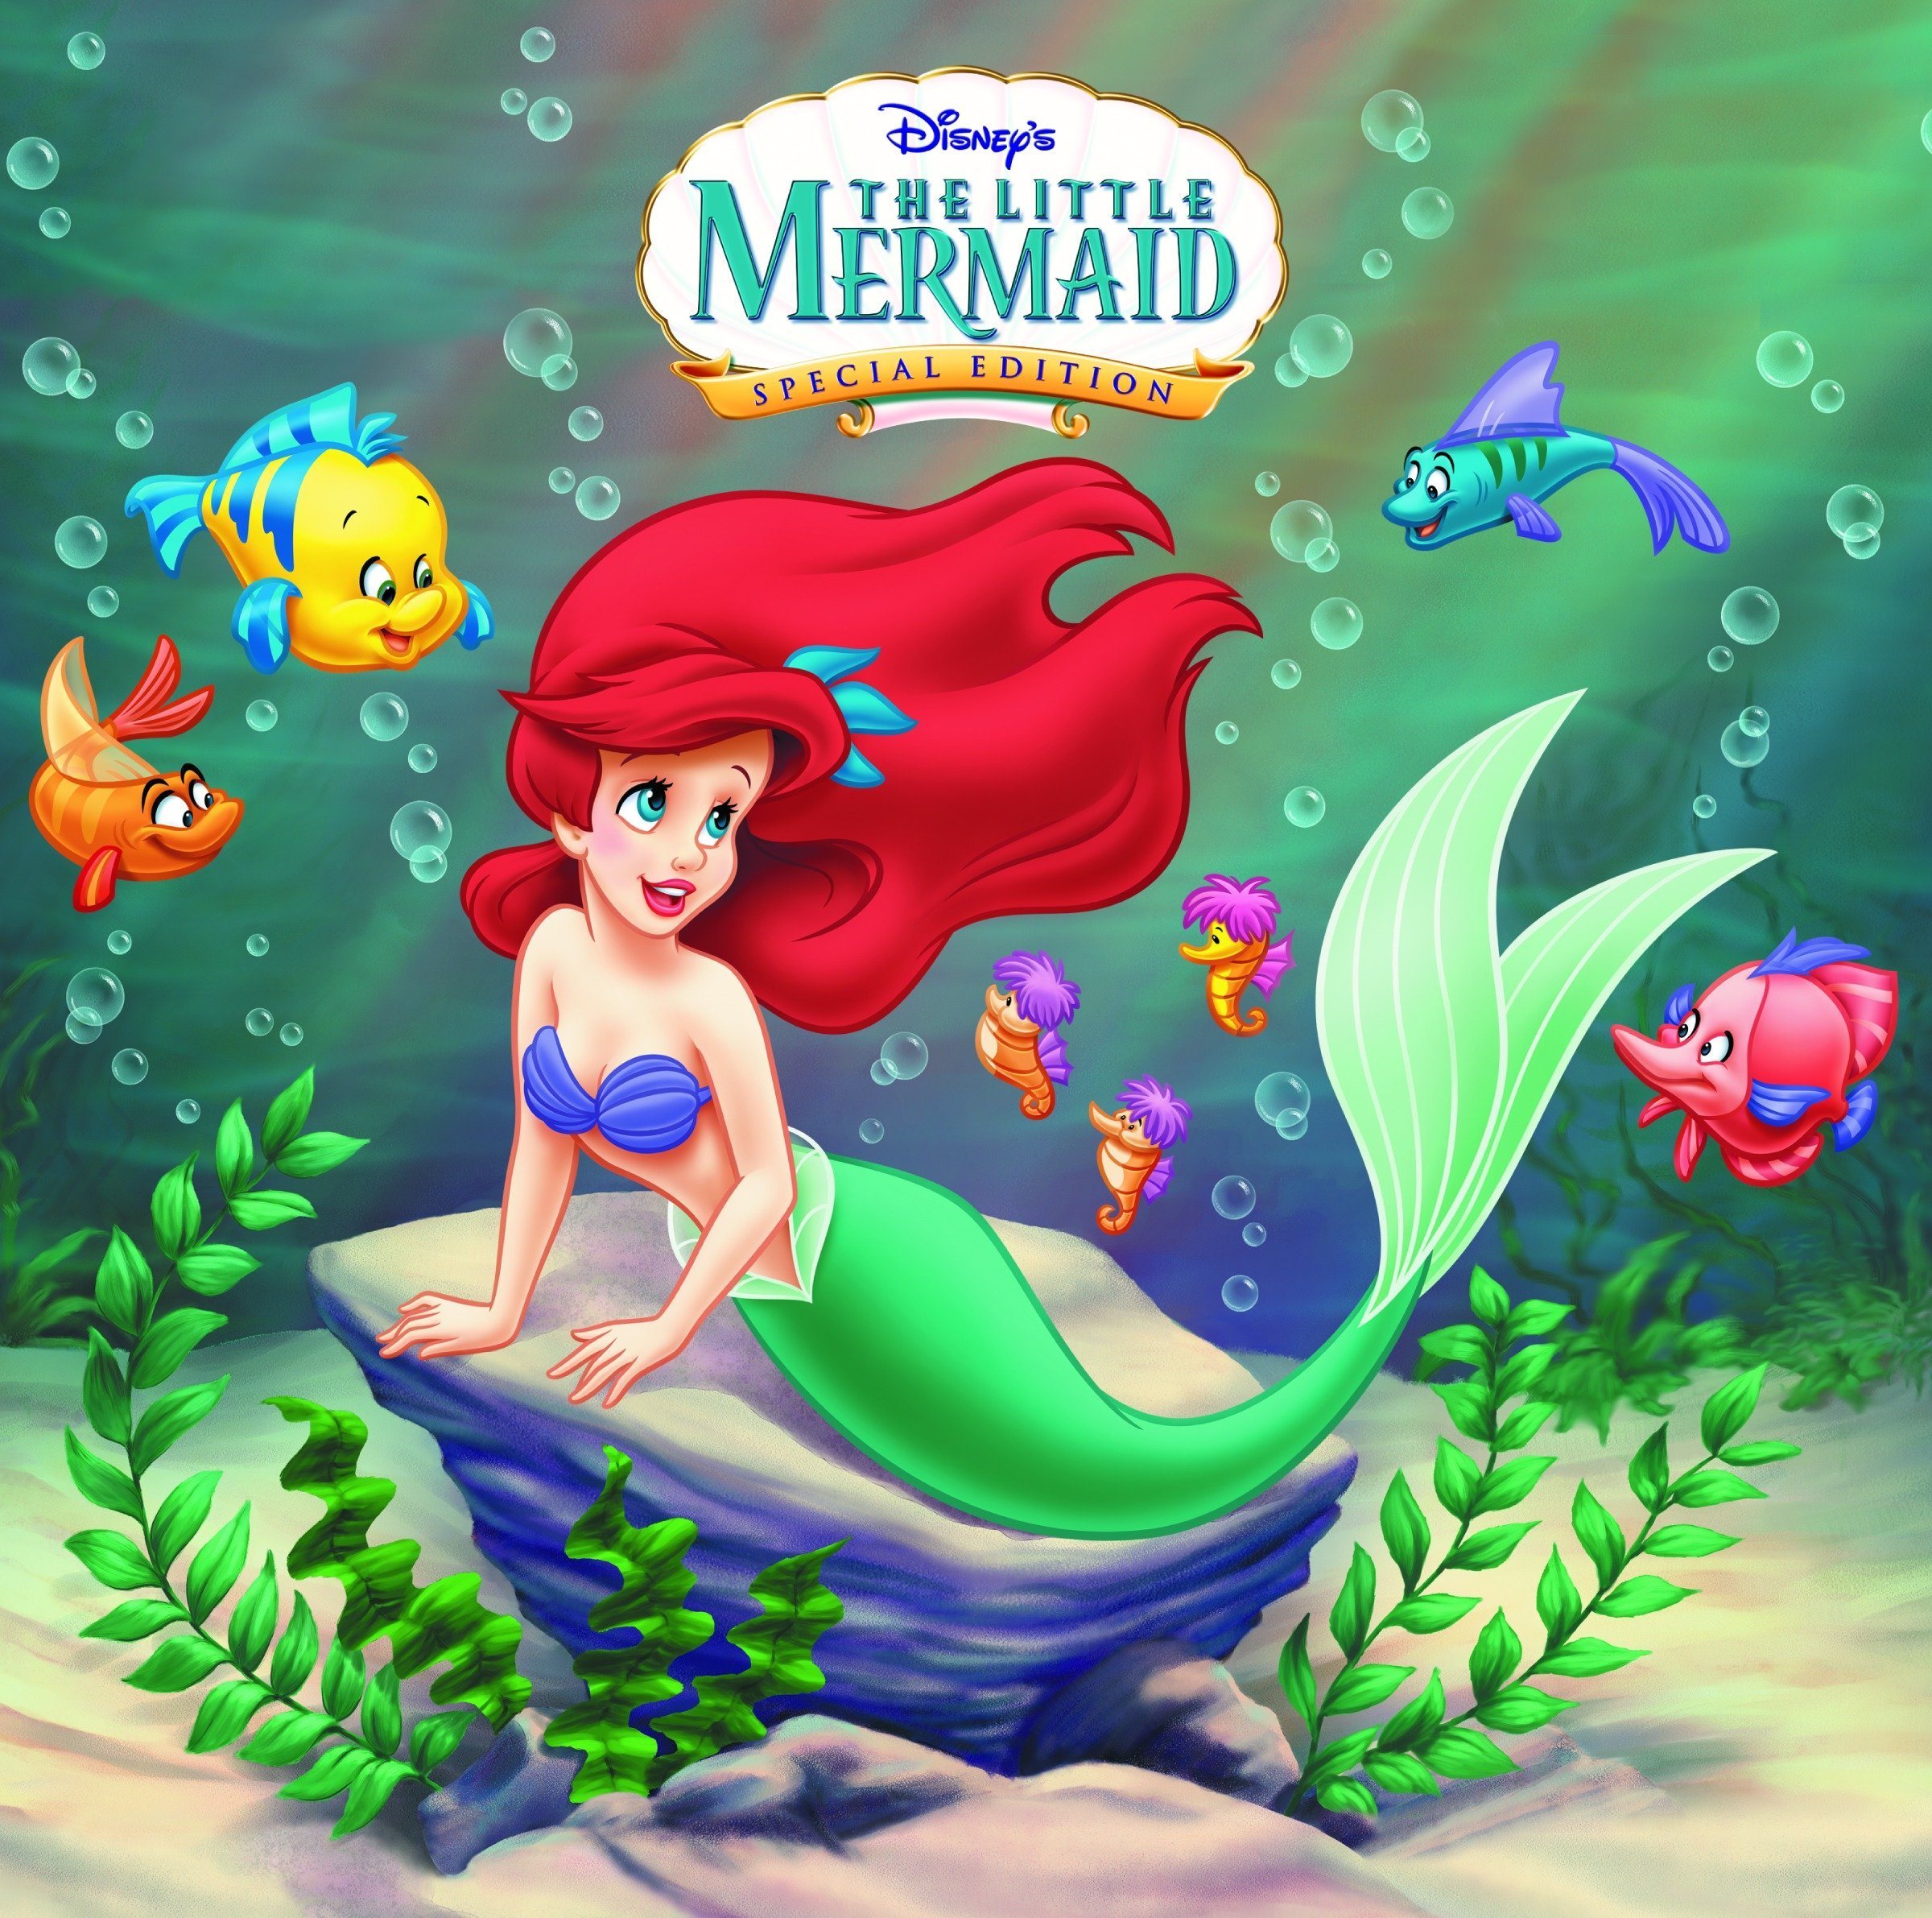 Disney S The Little Mermaid Disney Princess Pictureback Stephanie Calmenson Francese Mateu 8601419935710 Amazon Com Books